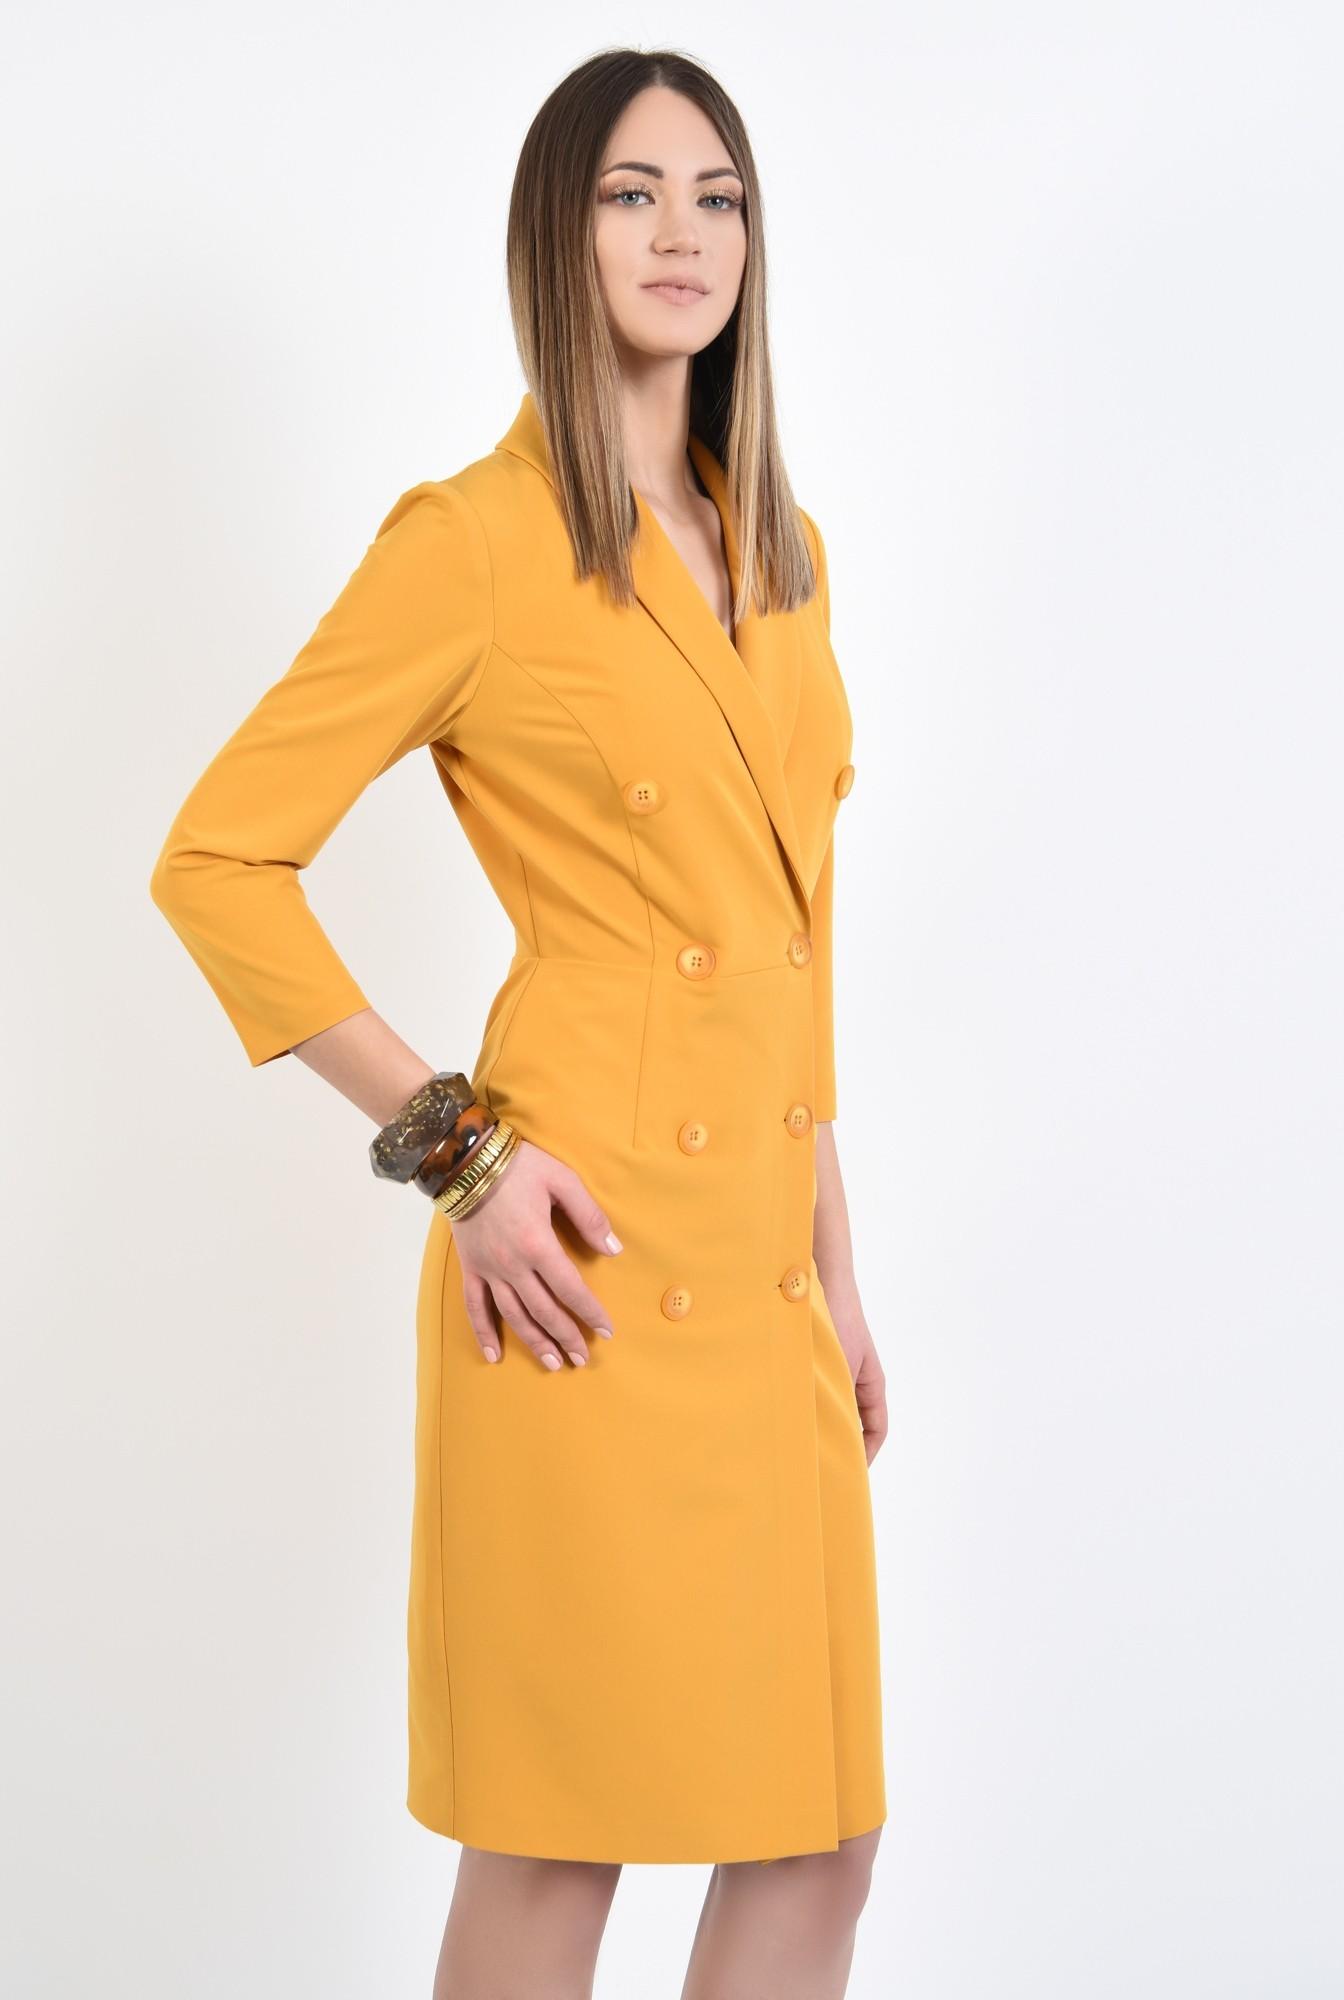 0 - 360 - rochie eleganta, conica, midi, galbena, mustar, rochie office